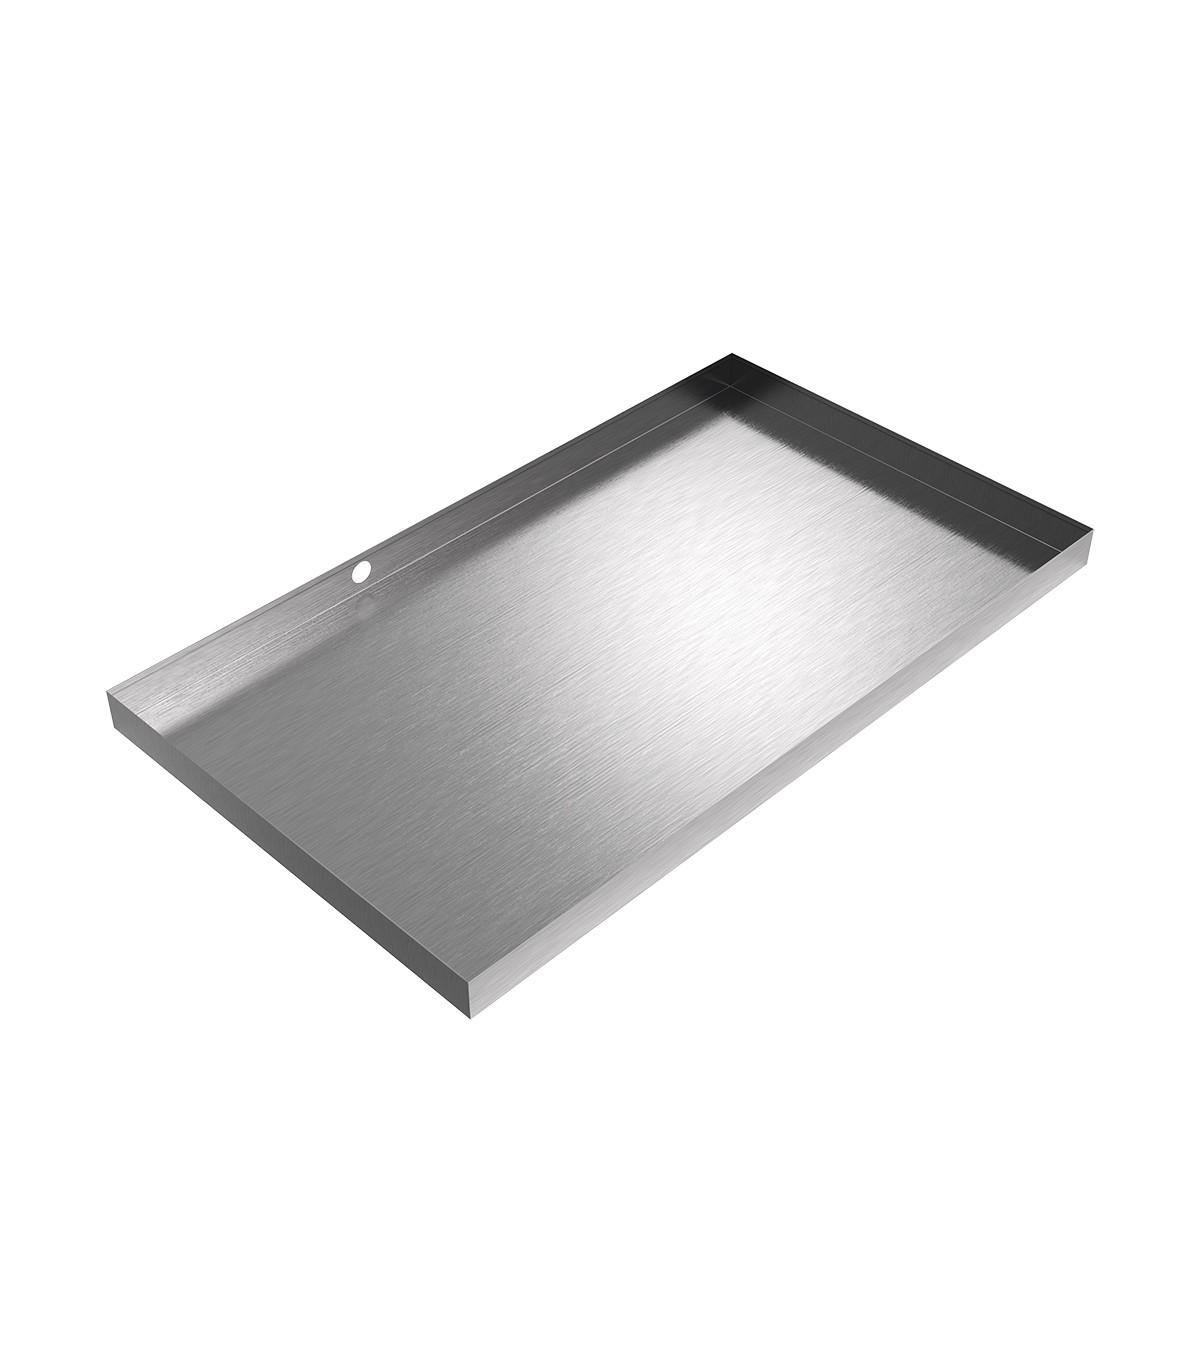 Maytag Maxima Washer Steam Dryer Drain Pan